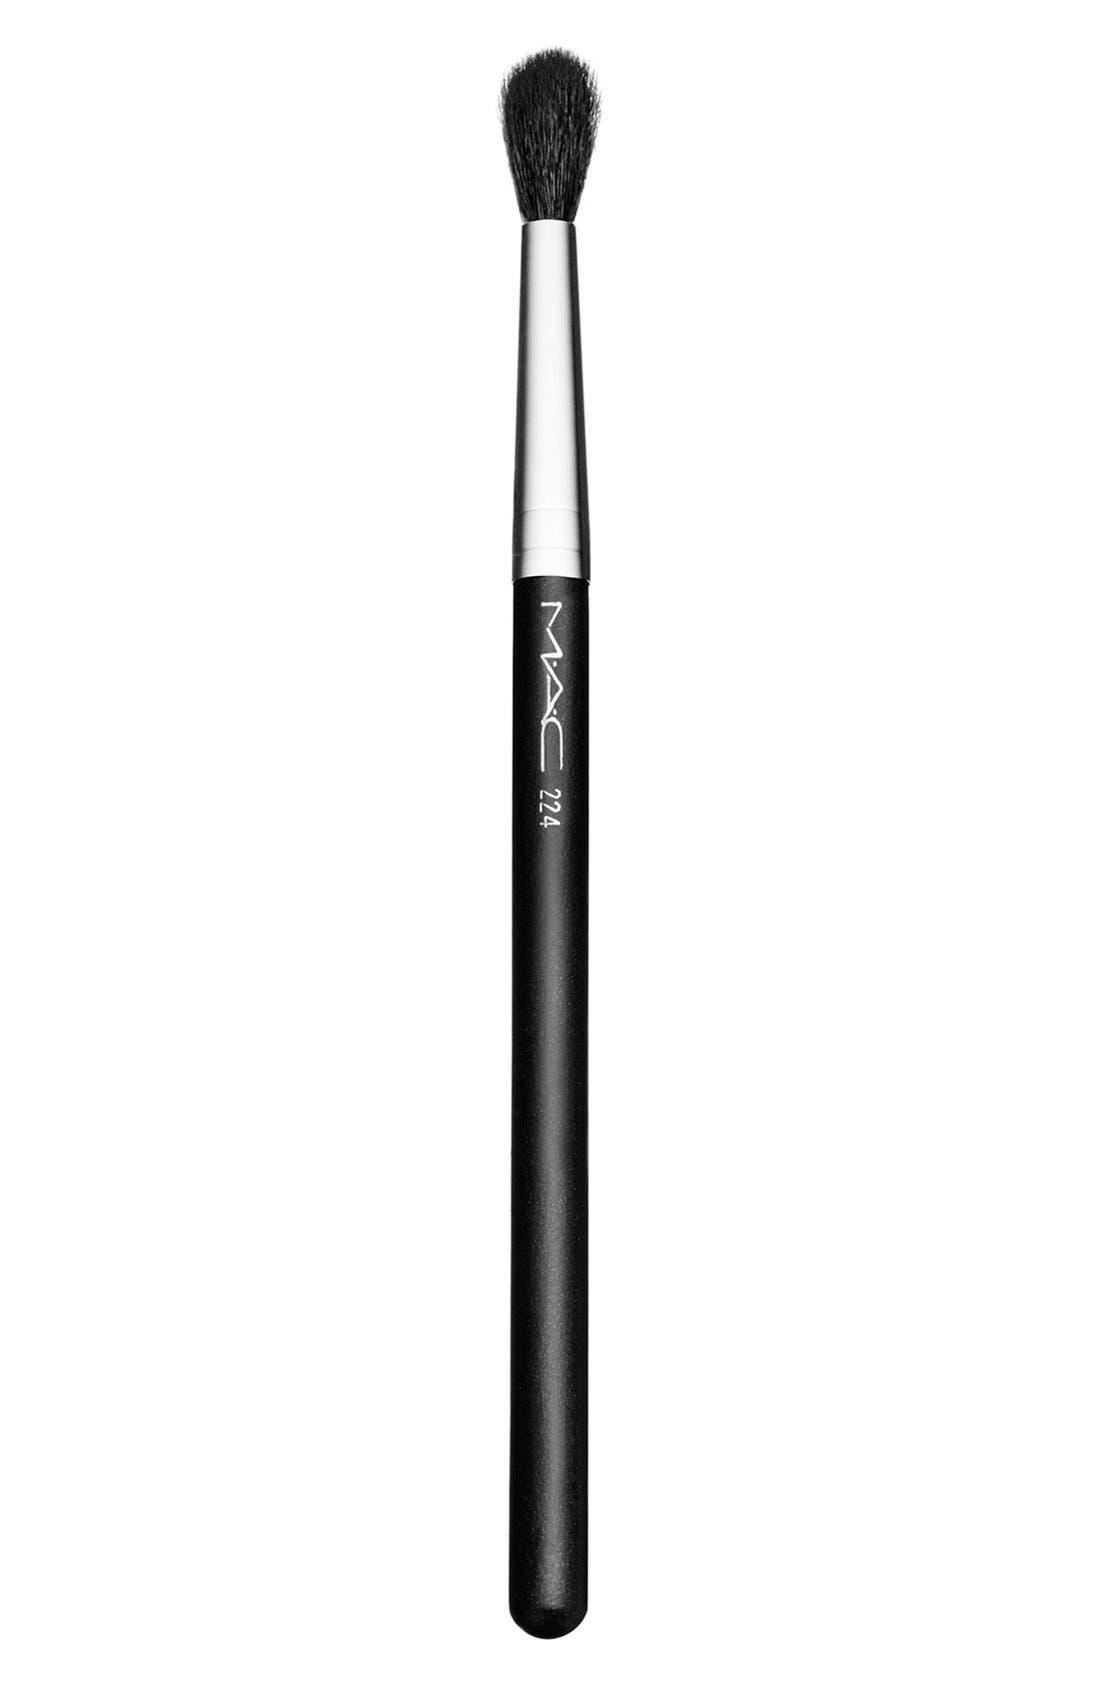 MAC 224 Tapered Blending Brush,                             Main thumbnail 1, color,                             000